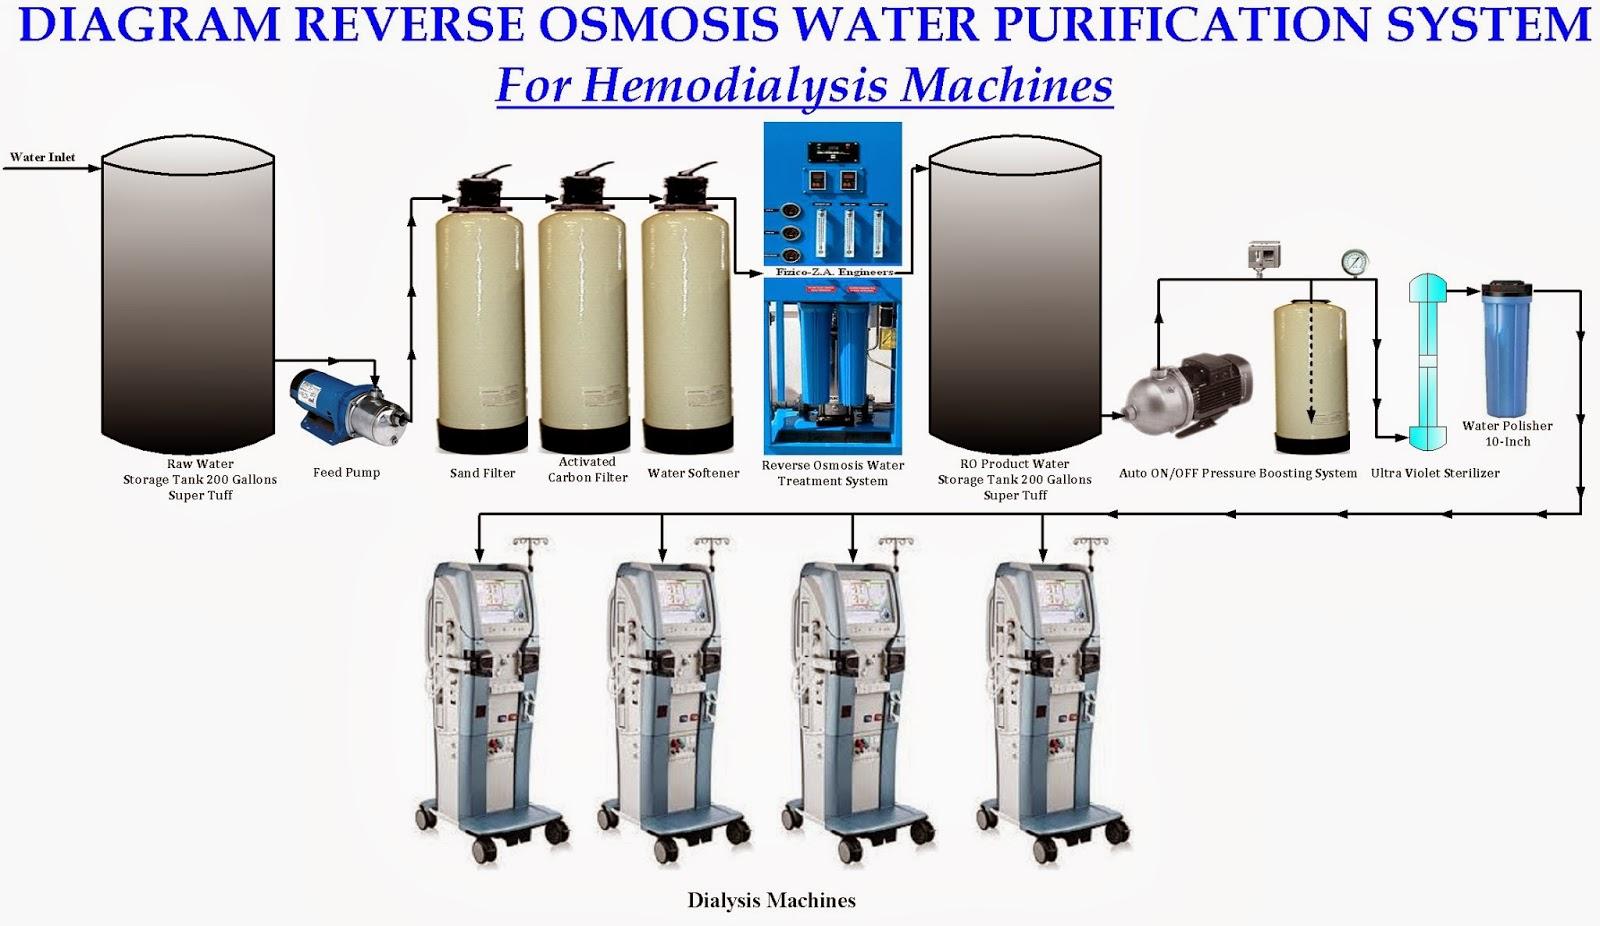 Piping Diagram For Reverse Osmosis System Not Lossing Wiring Water Filtration Library Rh 47 Skriptoase De Installation Manual Culligan